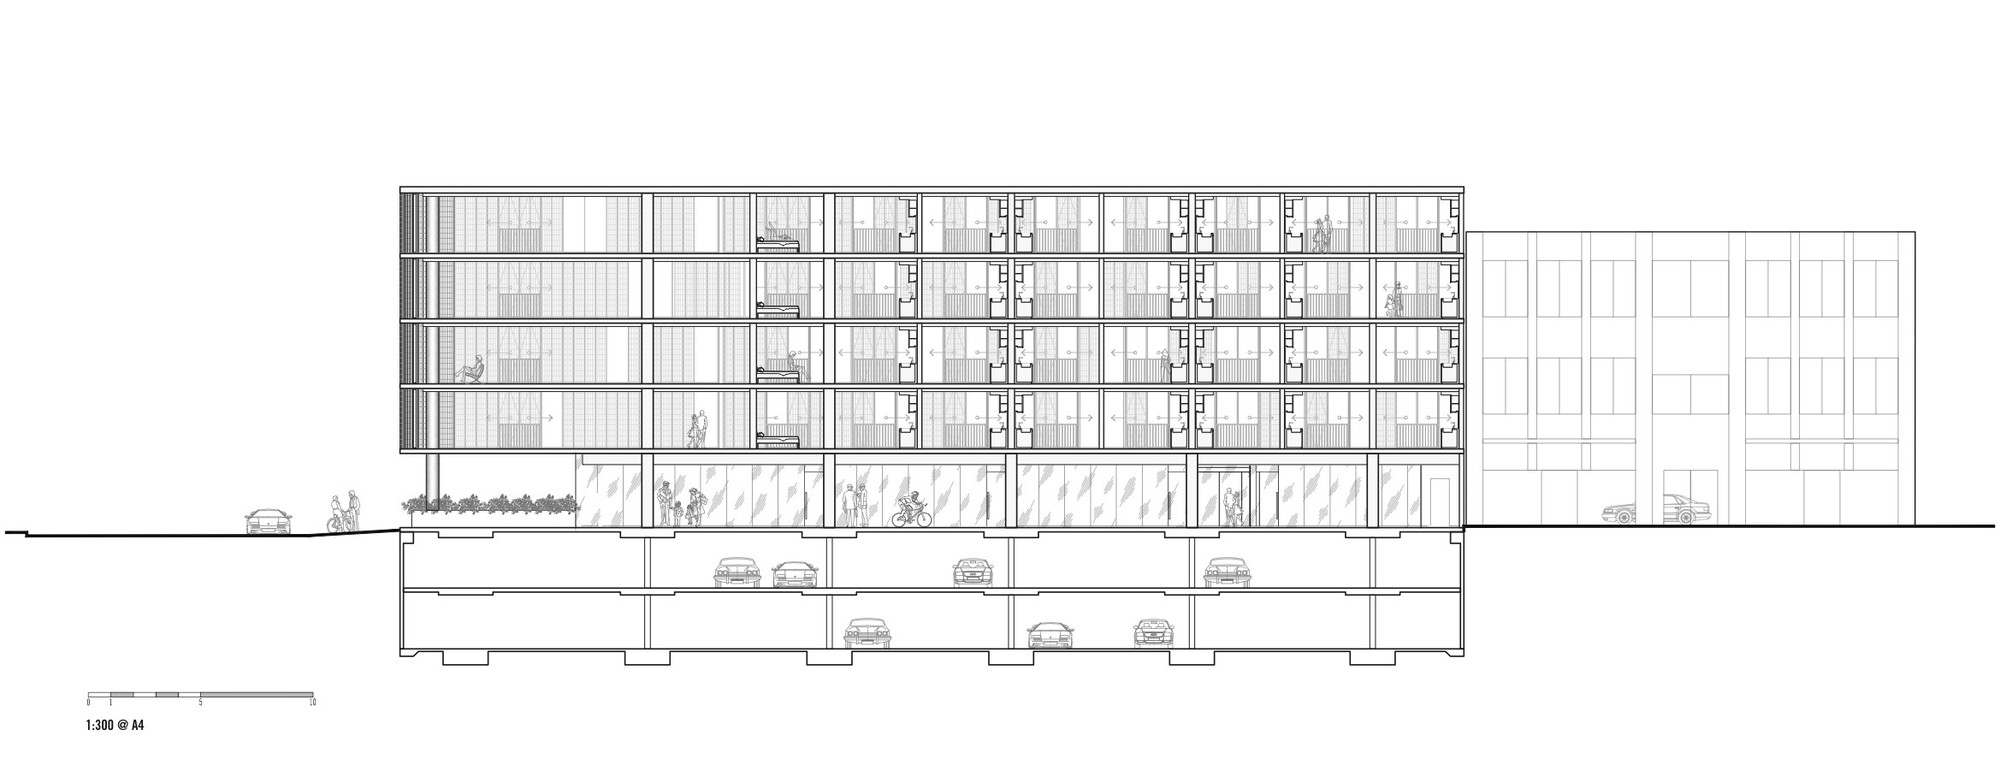 Gallery of Luna Apartments / Elenberg Fraser - 25